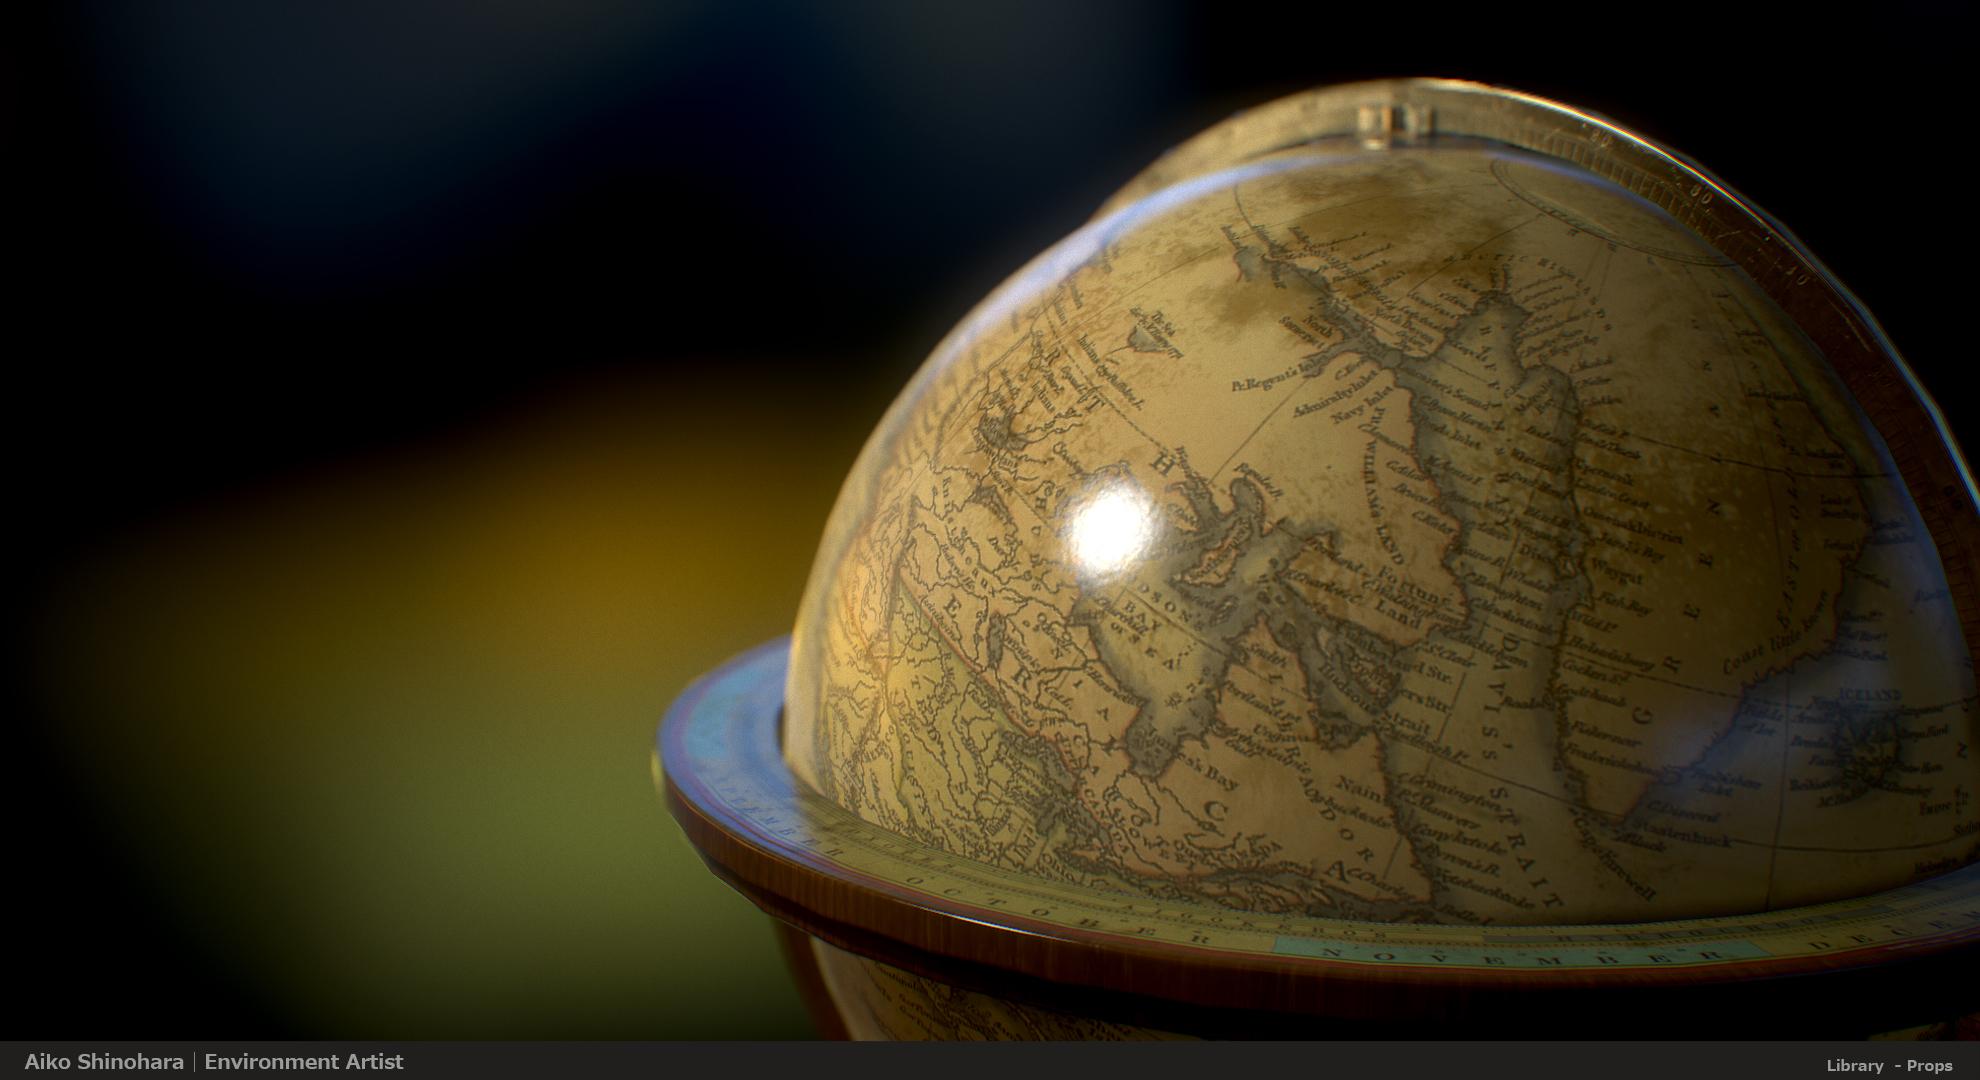 Props_Terrestrial Globe02